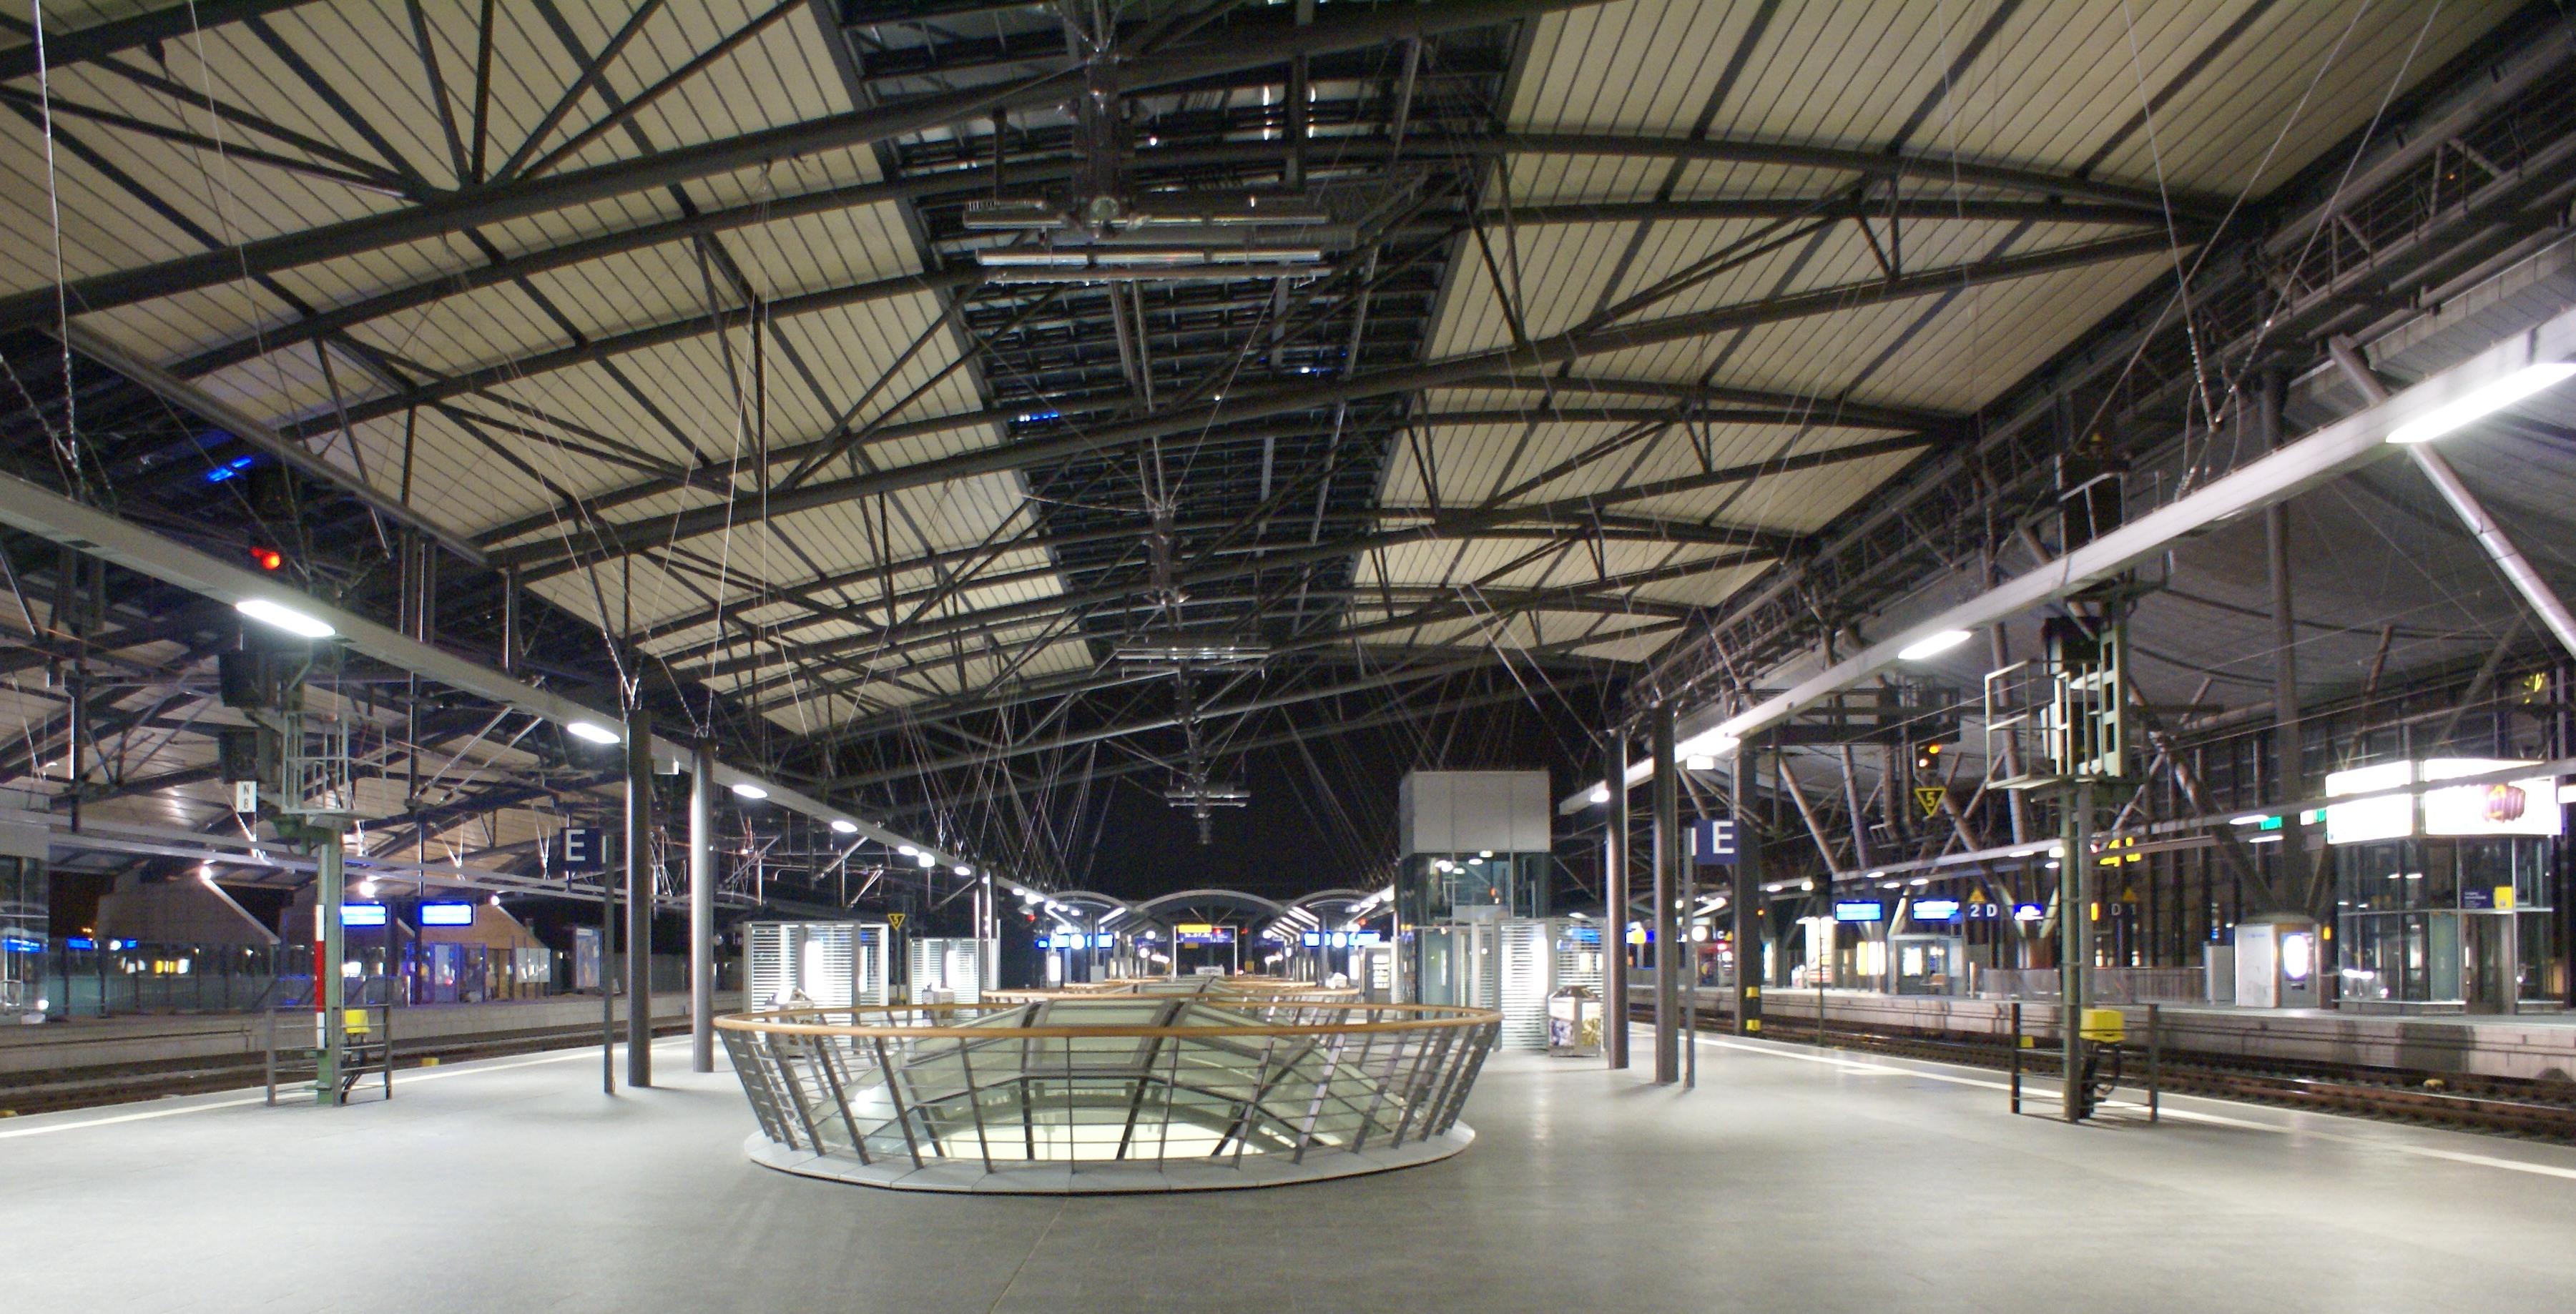 Bahnhof Erfurt Geschäfte